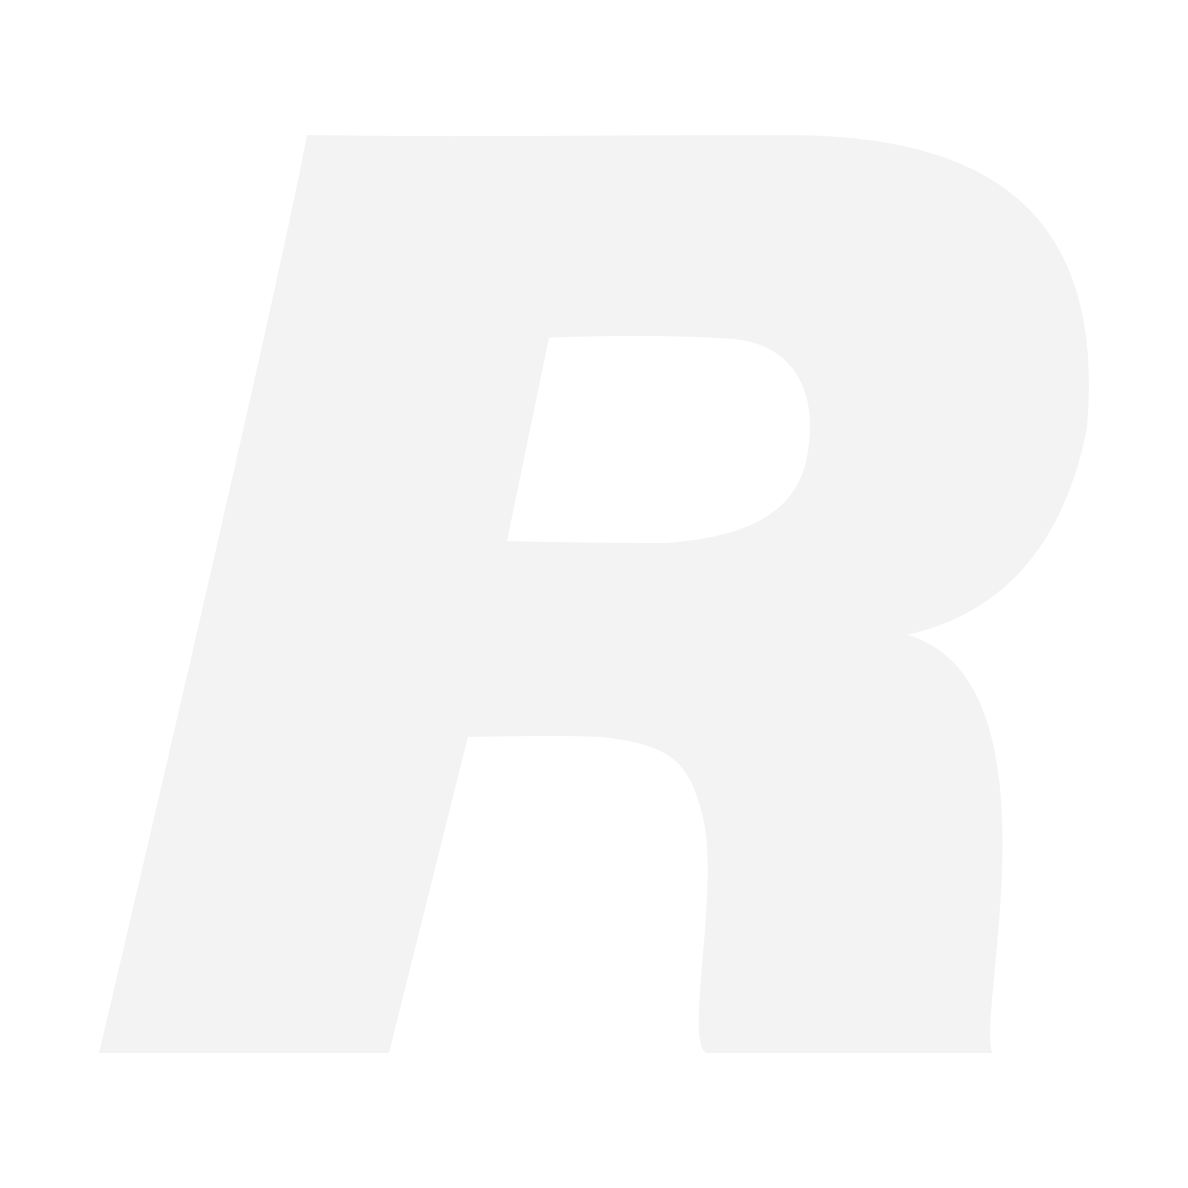 GoPro Pro 3.5mm Mic Adapter (Hero 5 Black/Session)